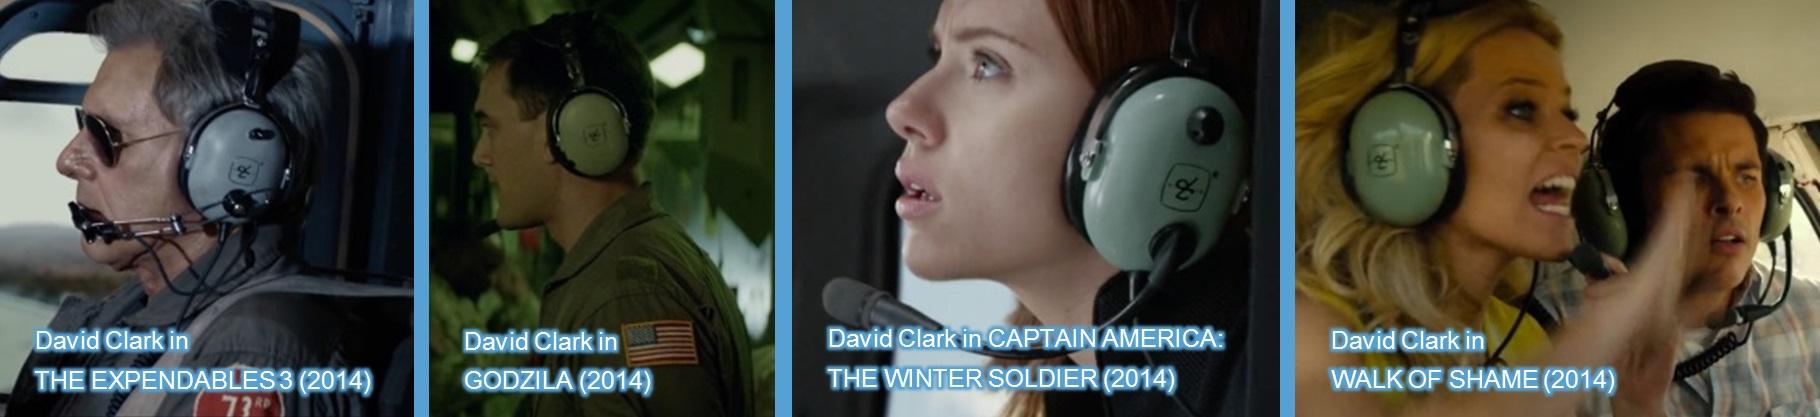 david clark in movies